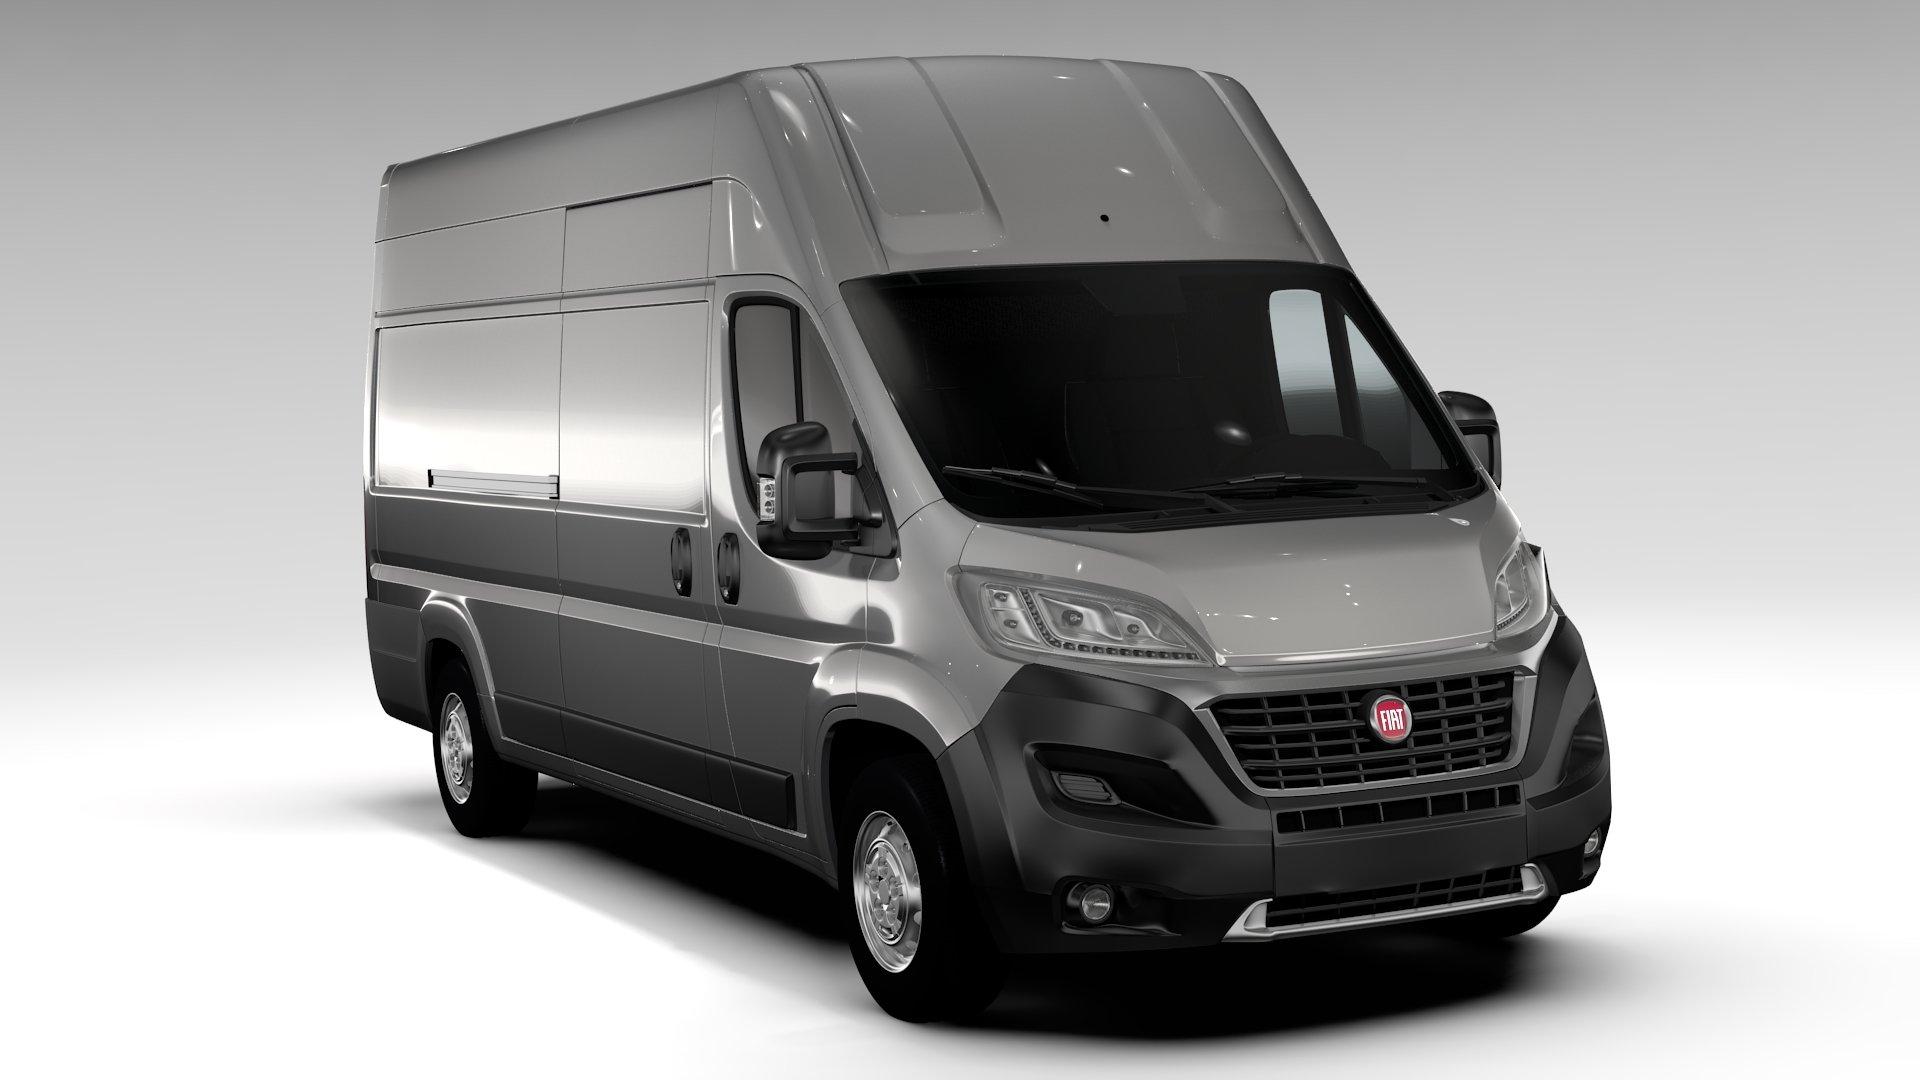 fiat ducato van l4h3 2017 vehicle models creative market. Black Bedroom Furniture Sets. Home Design Ideas